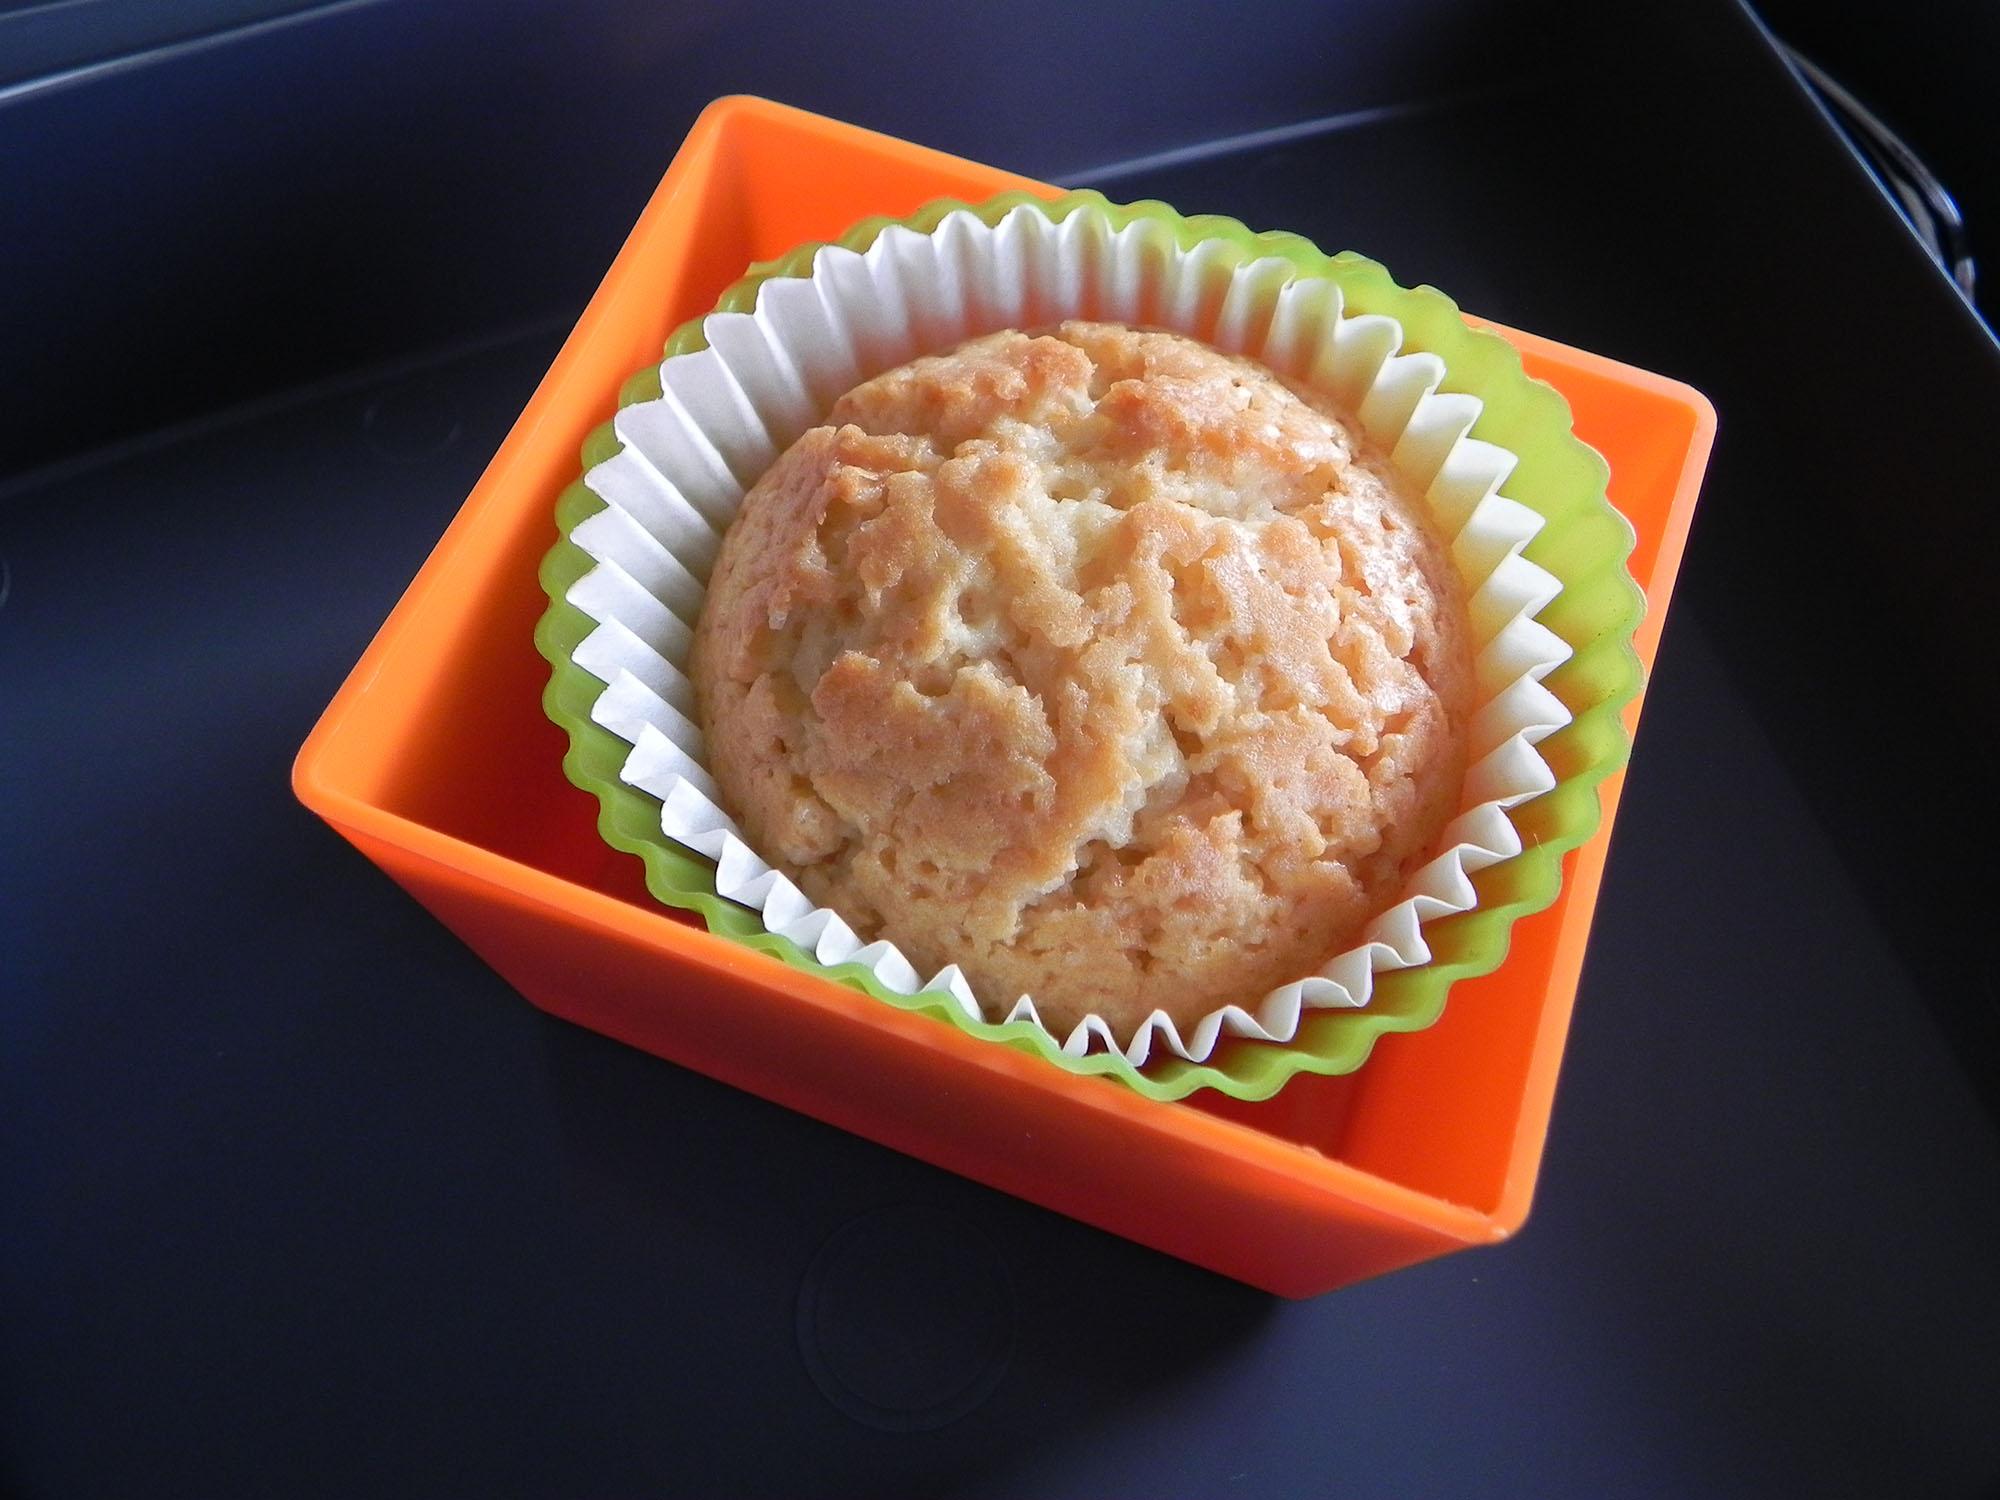 Muffins Final Shot